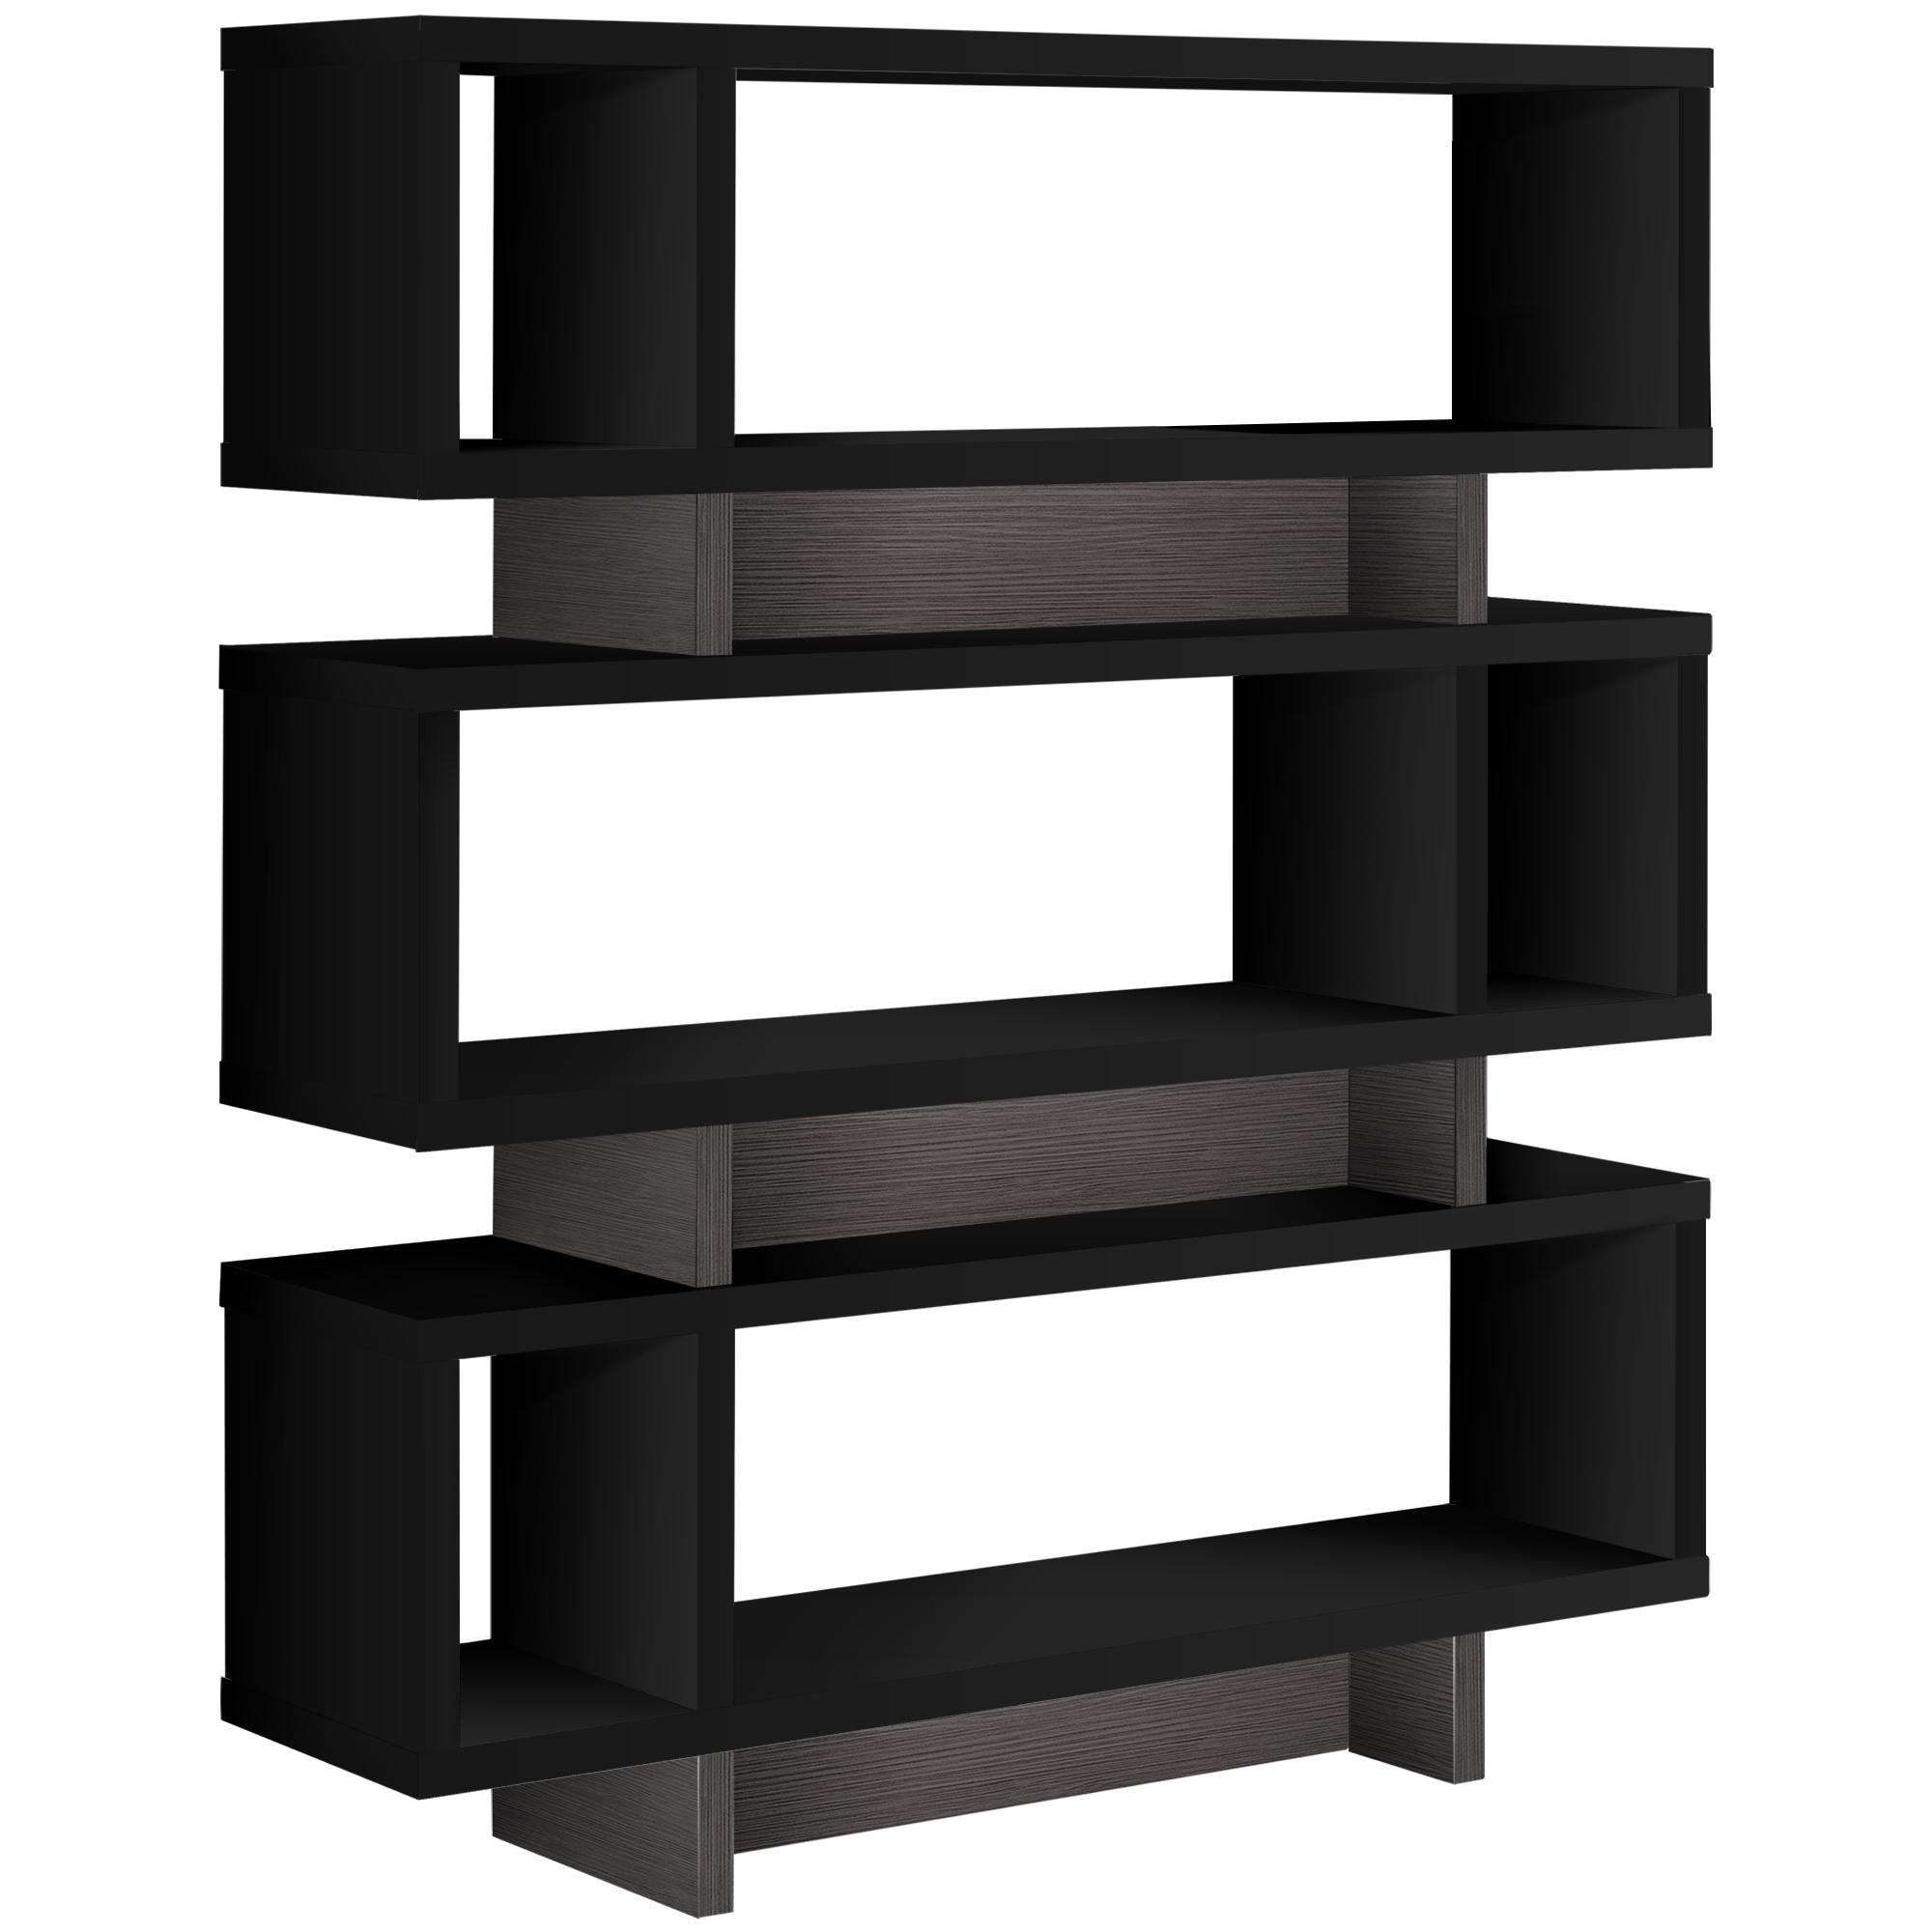 "12"" x 47.25"" x 54.75"" Black Grey Particle Board Hollow Core  Bookcase"